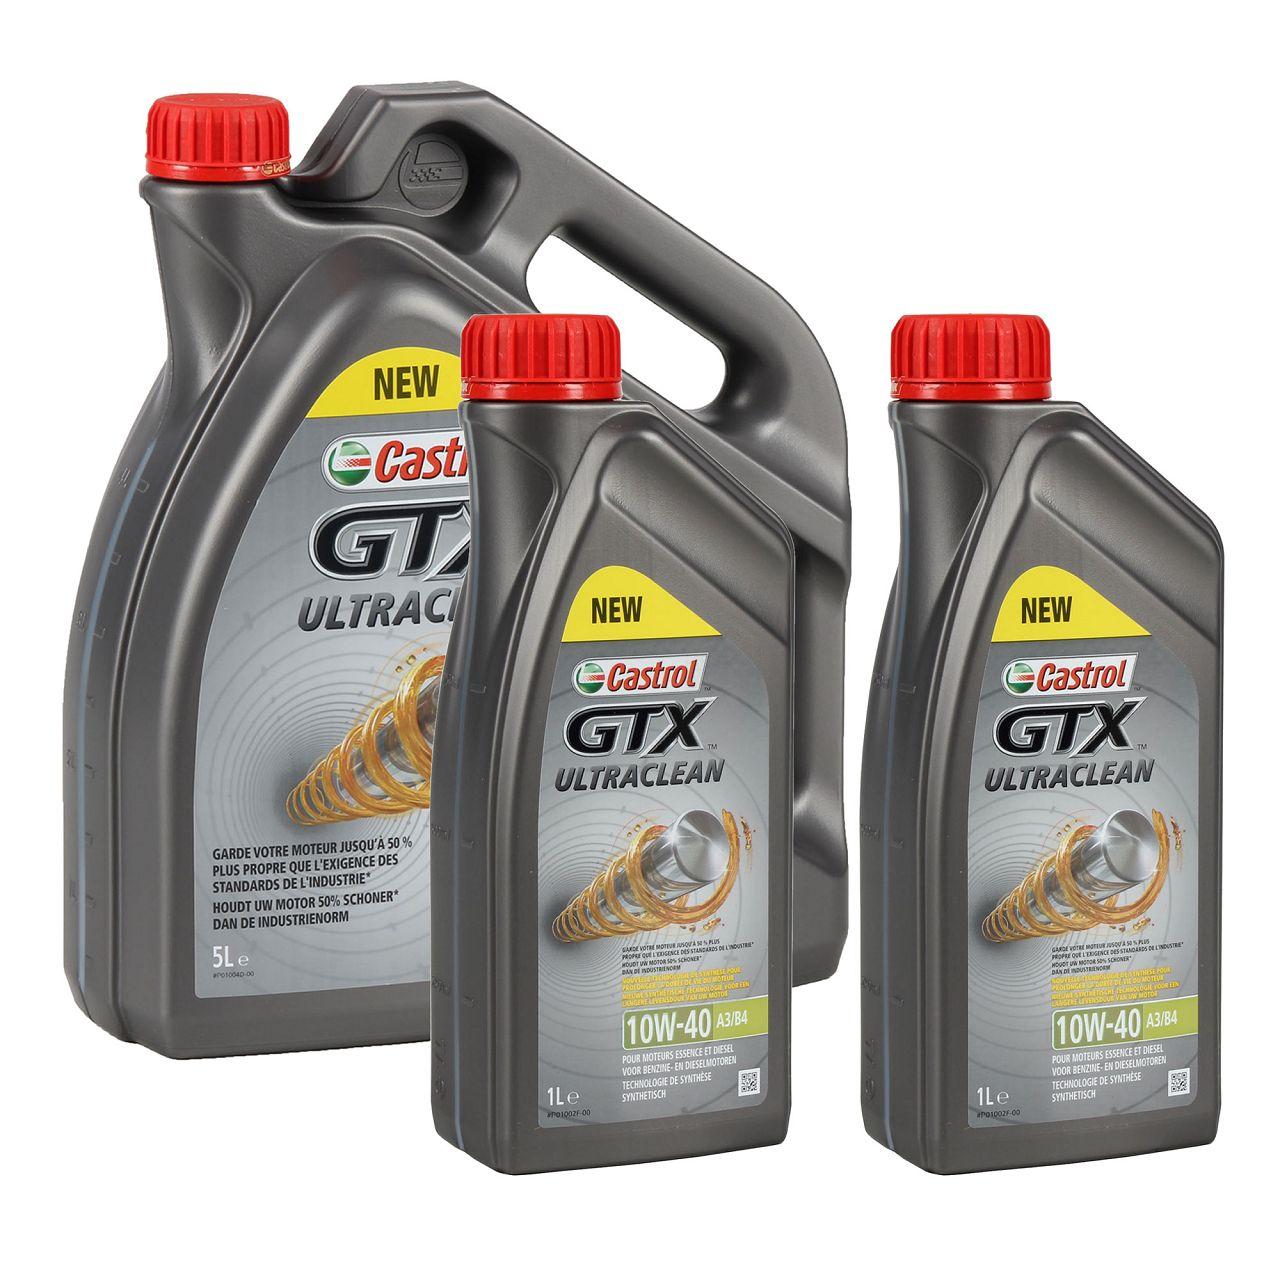 CASTROL Motoröl Öl GTX ULTRACLEAN 10W-40 10W40 A3/B4 - 7 Liter